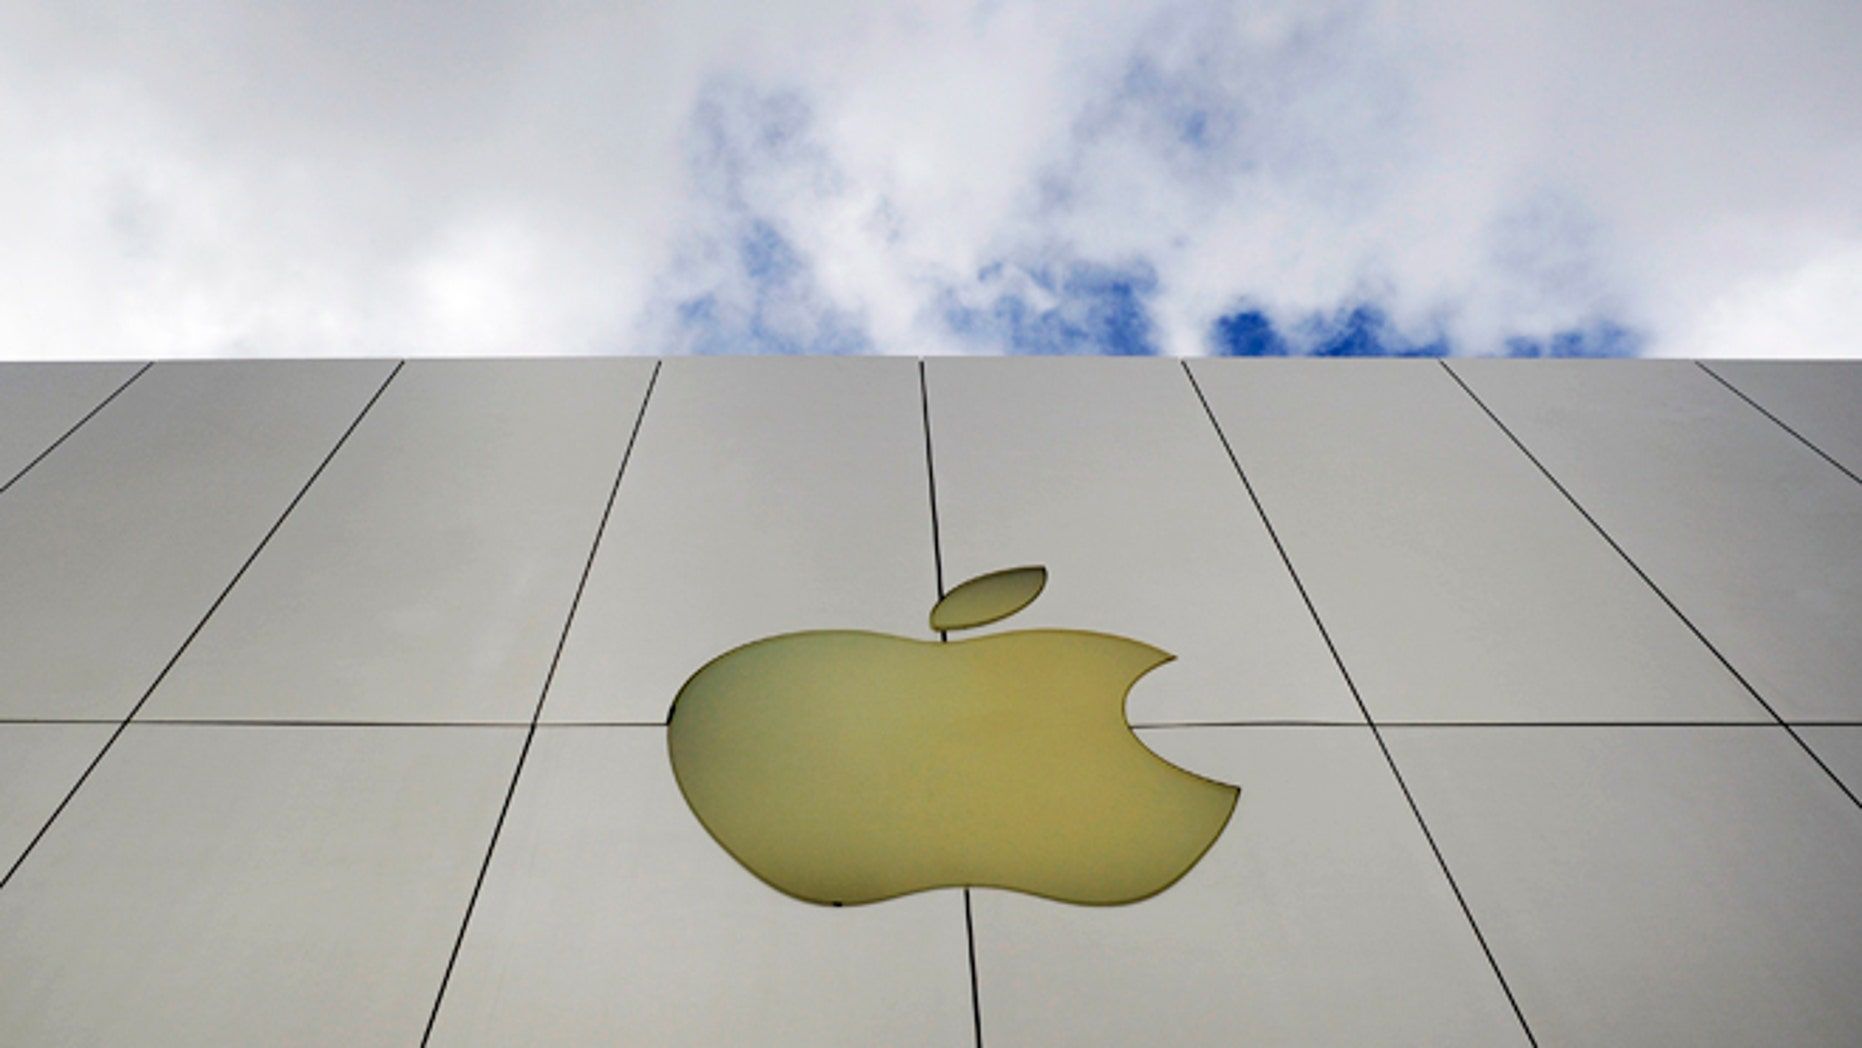 Jan. 25, 2013: The Apple logo is seen on an Apple store in San Francisco.